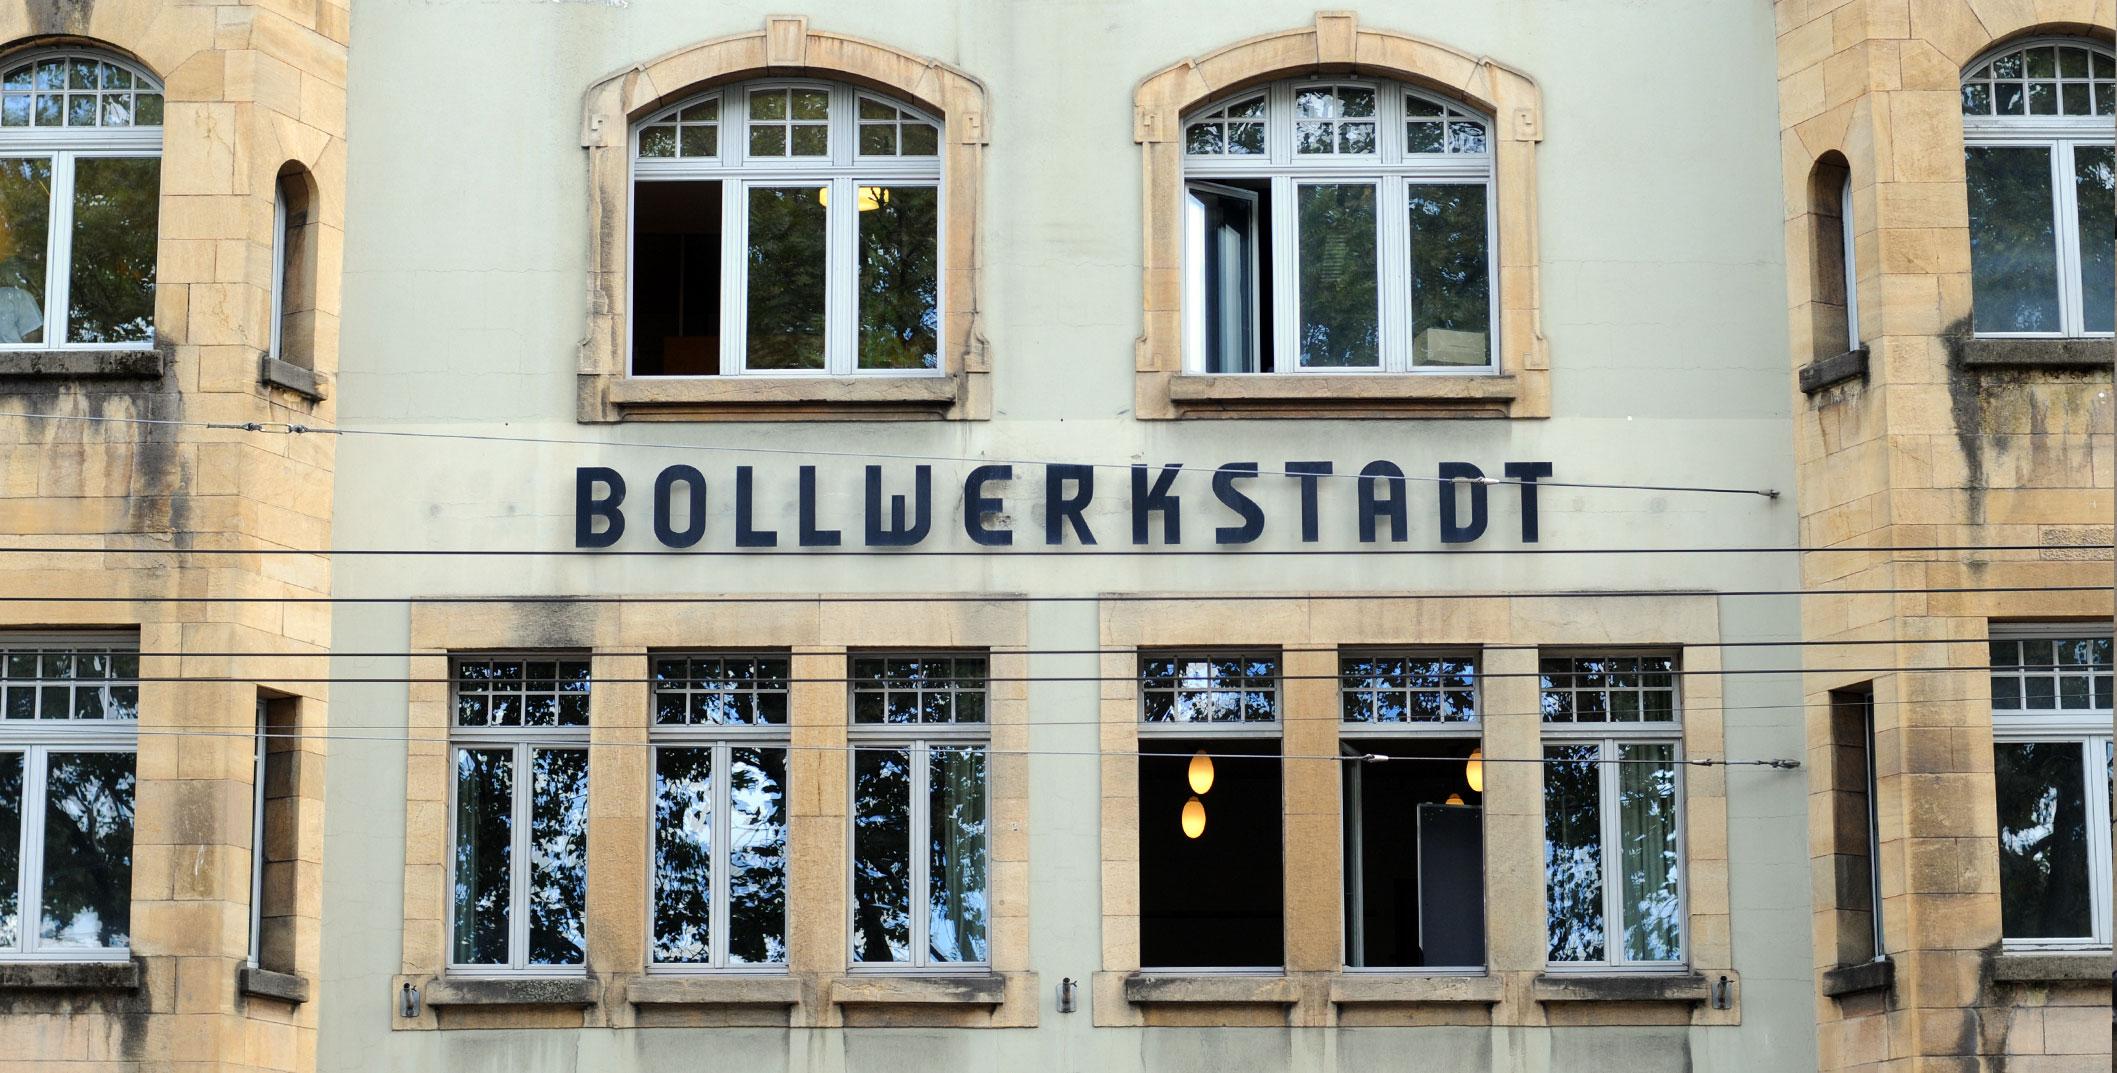 Bollwerkstadt